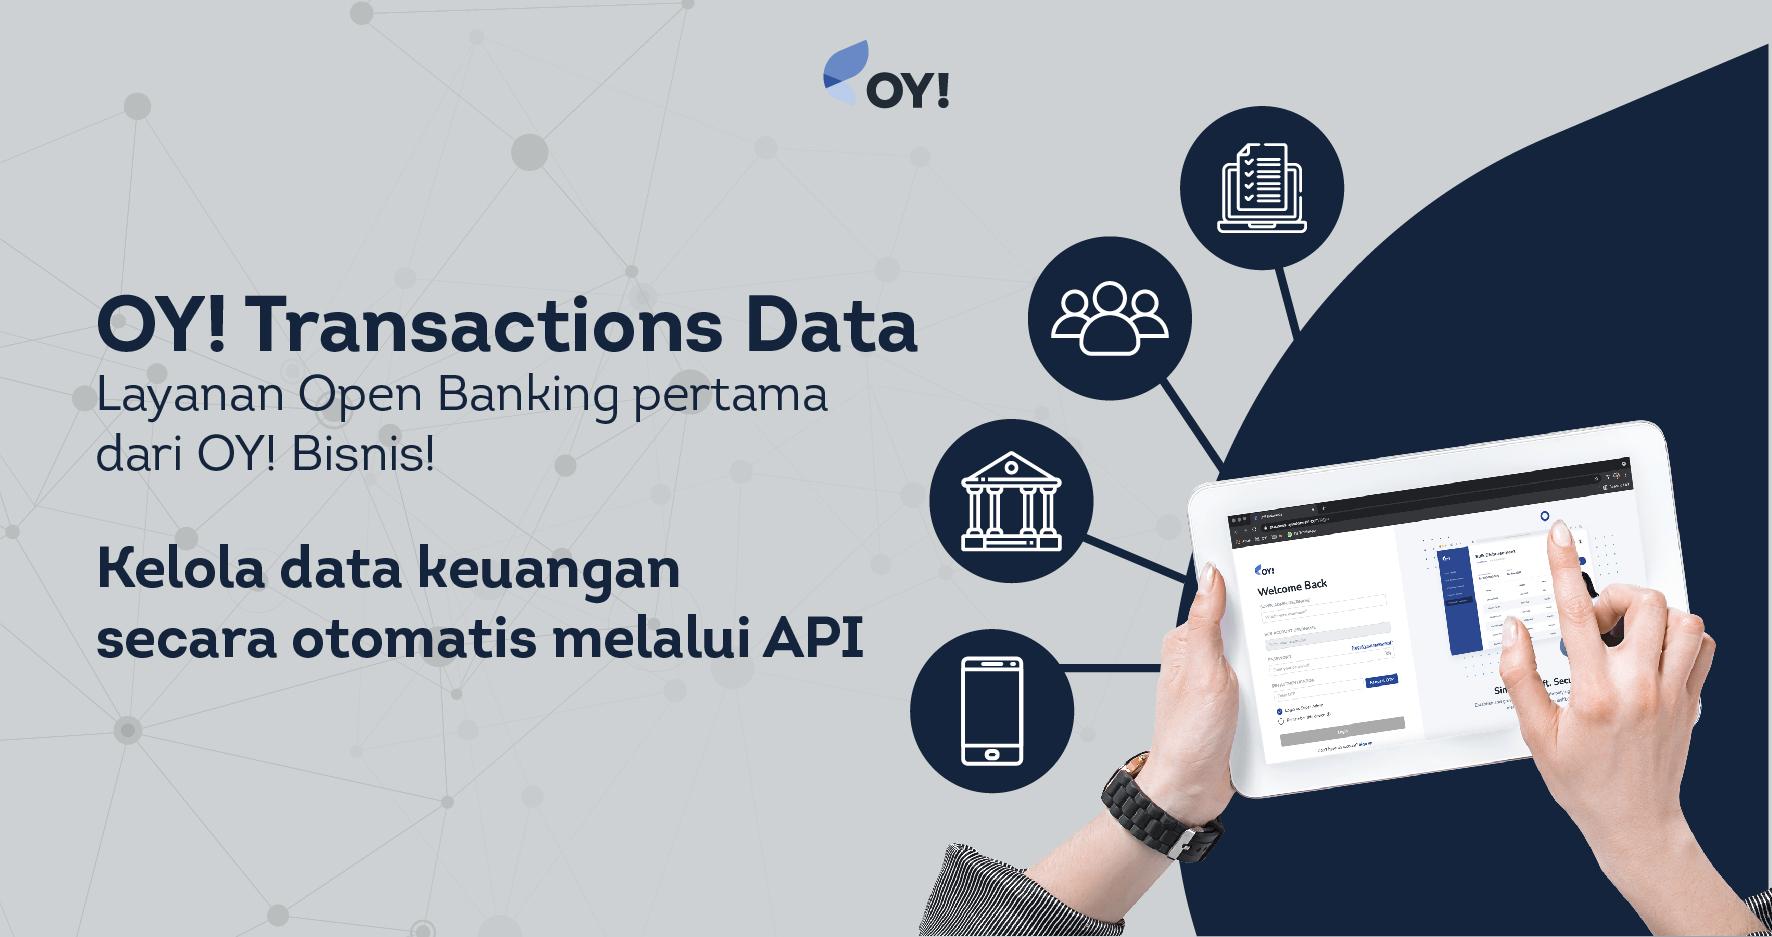 OY! Transaction Data